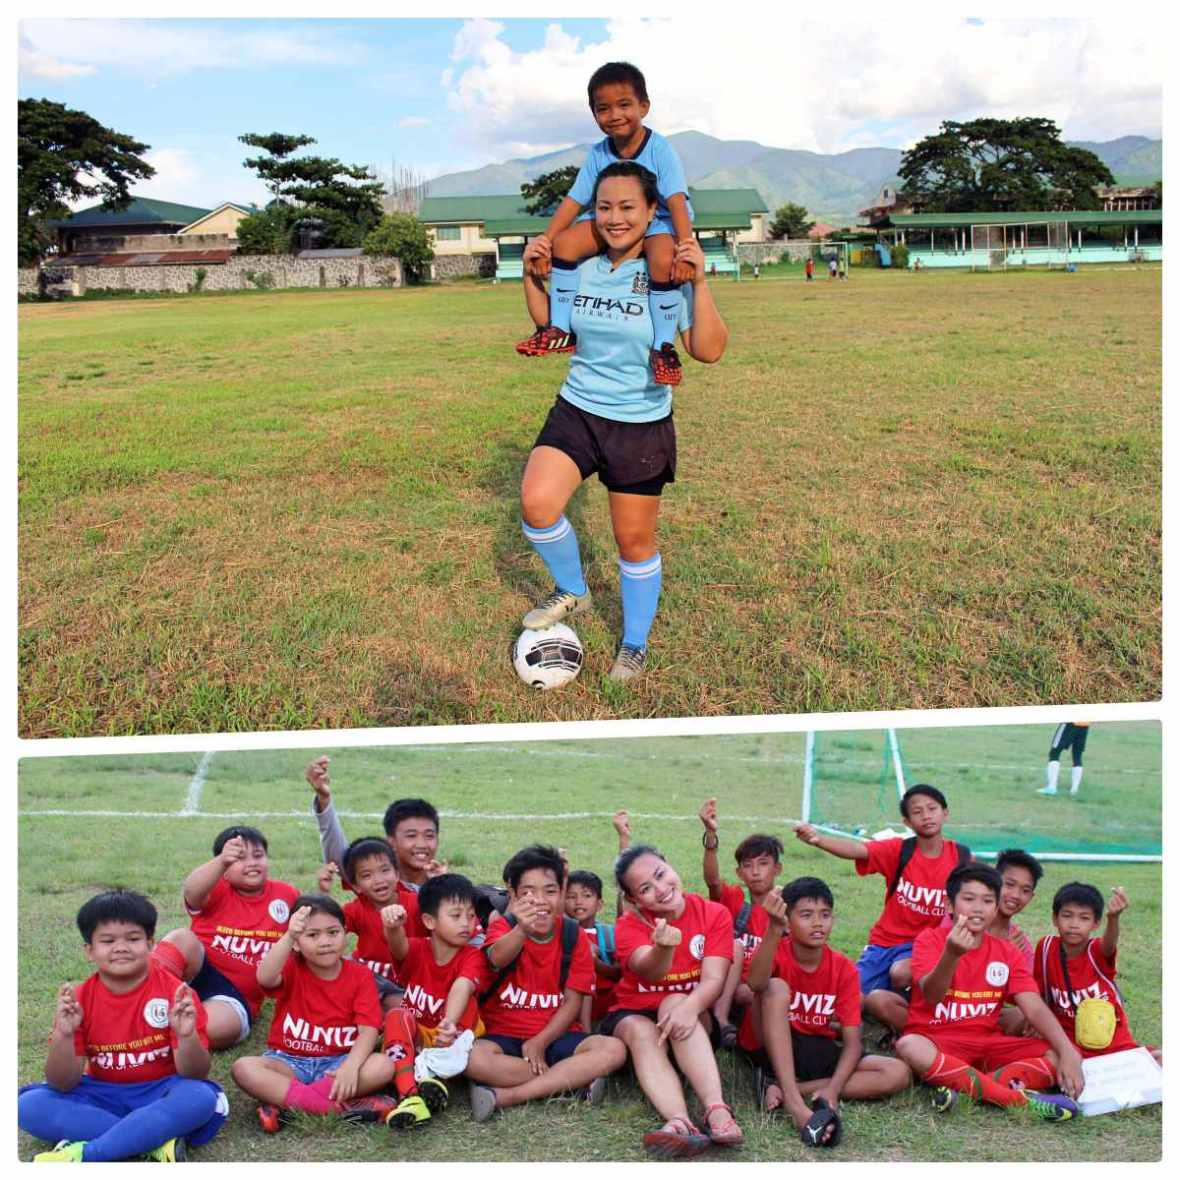 nuviz football kids